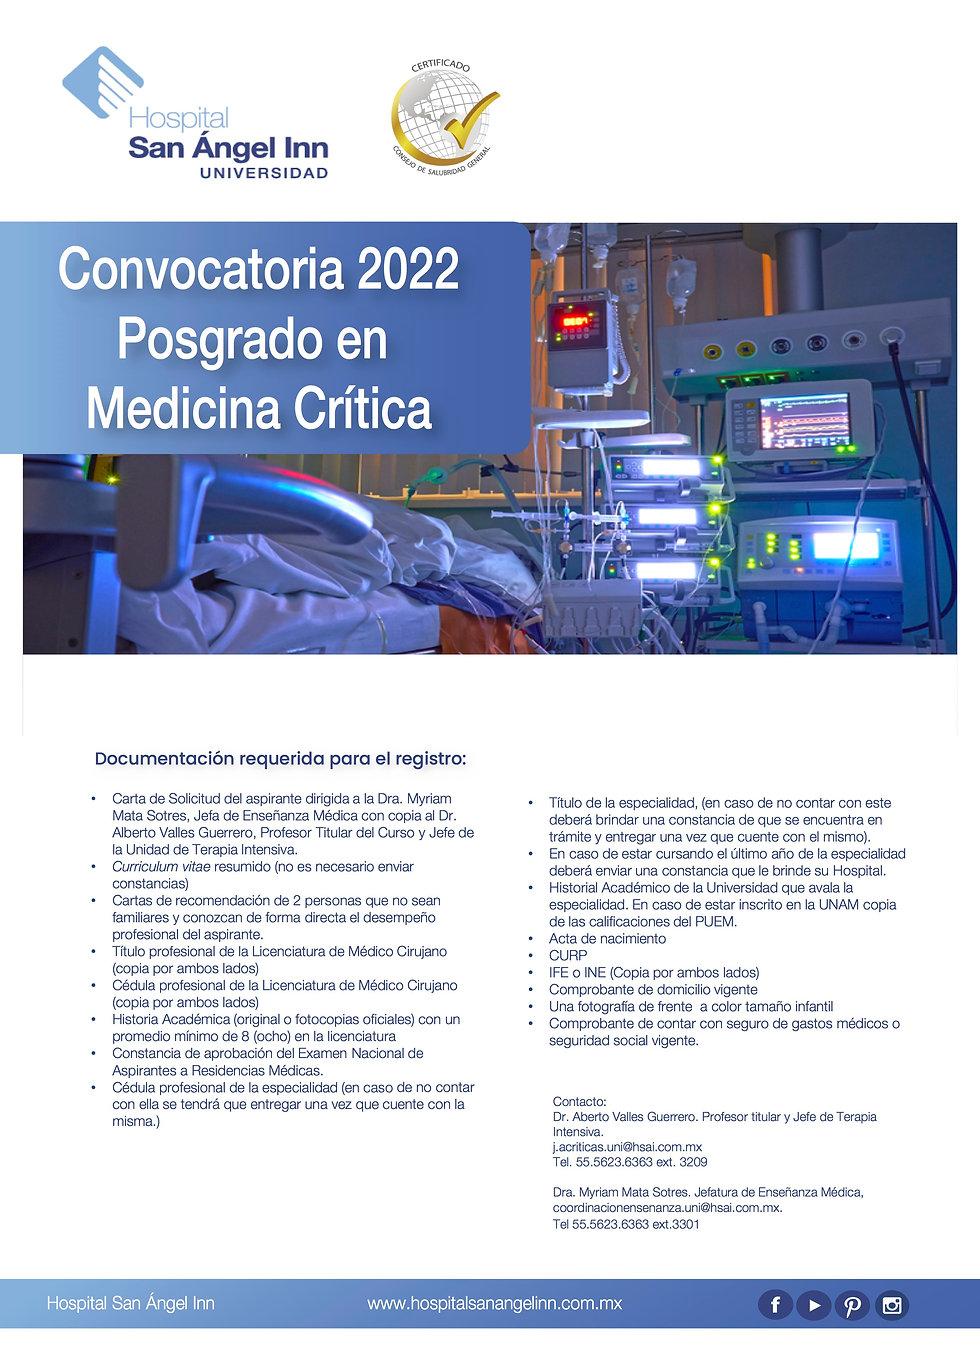 Documentación_ Convocatoria 2022.jpg